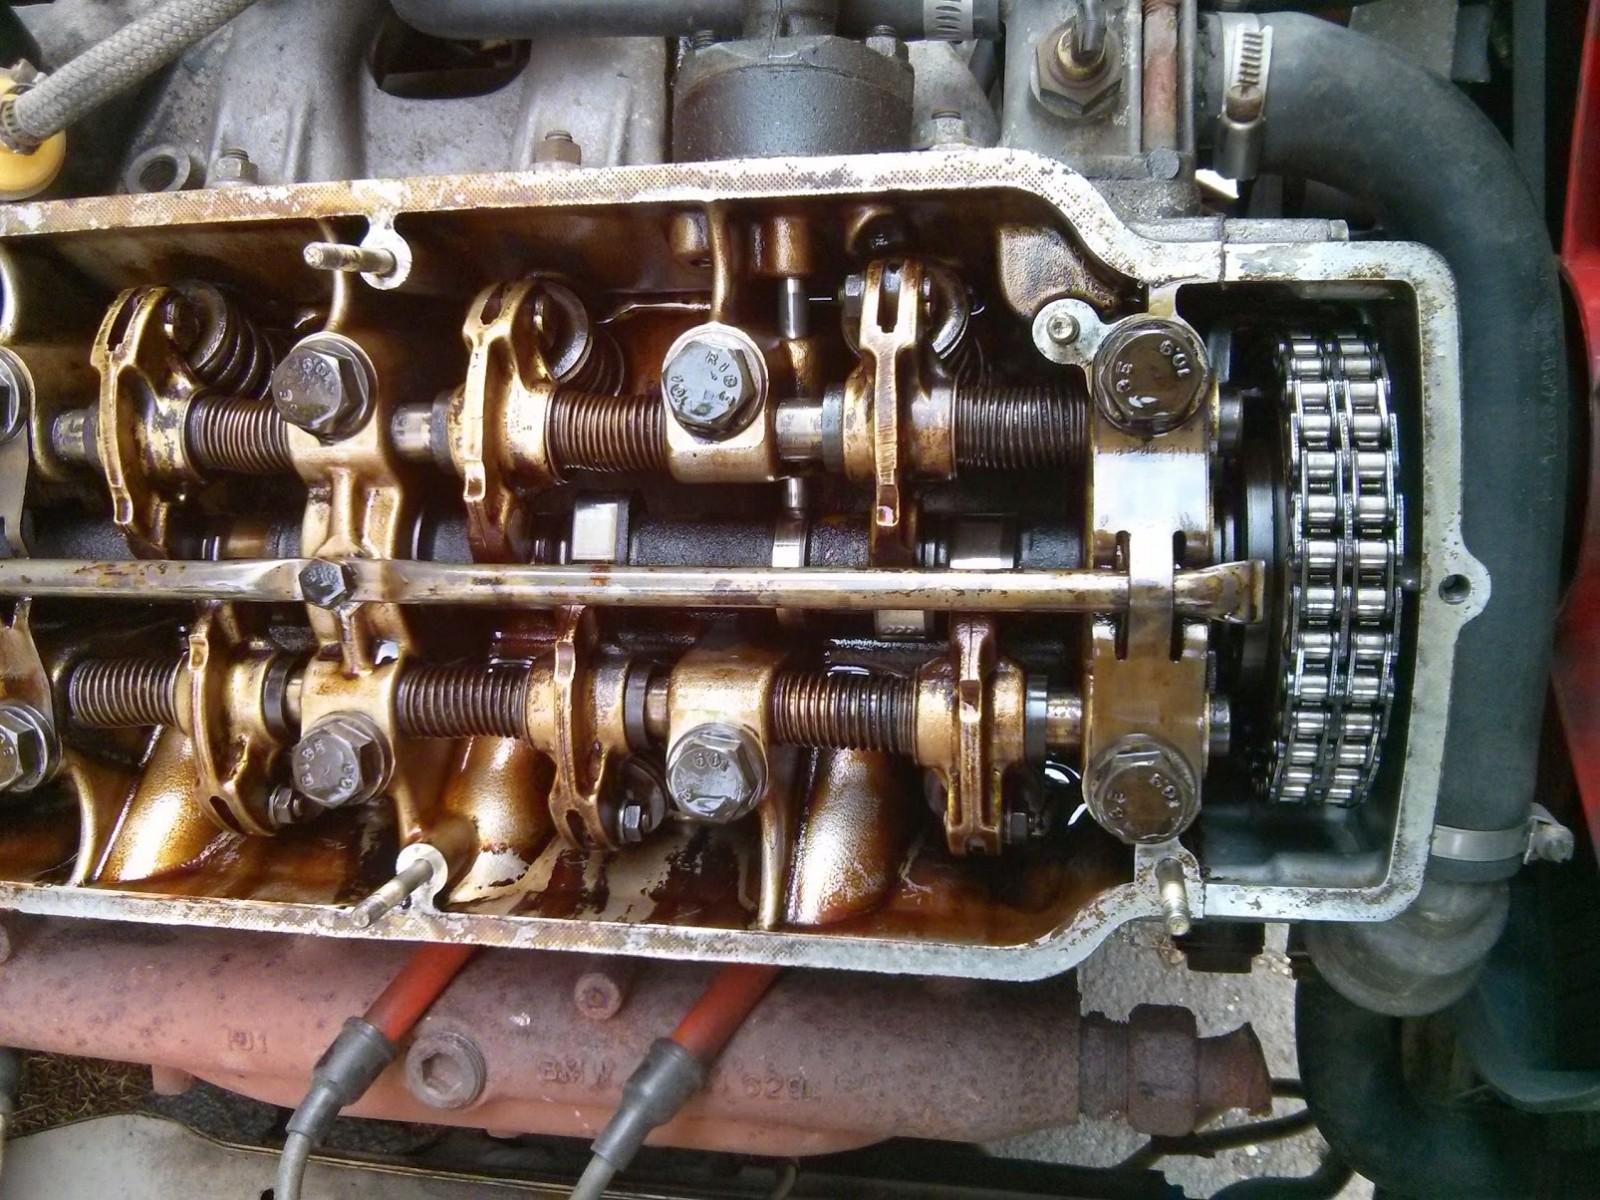 Bmw M10 Engine Diagram Valve Adjustment for Bmw M10 Motor Engine and Drivetrain Bmw Of Bmw M10 Engine Diagram